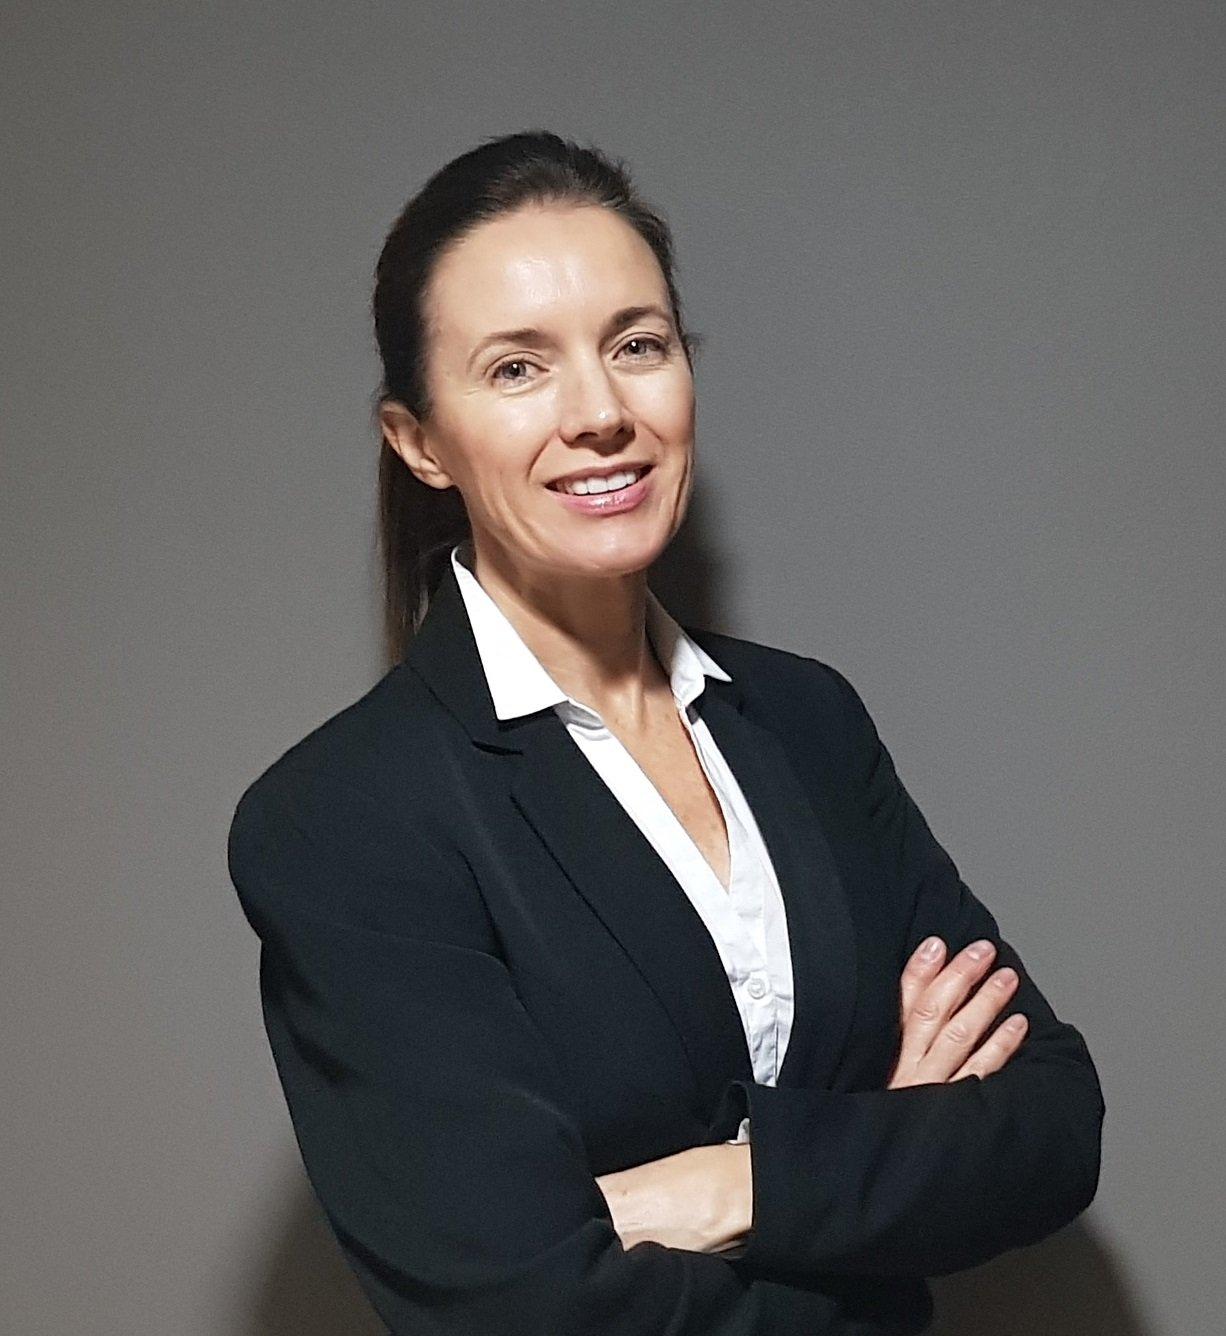 Melissa Quigley